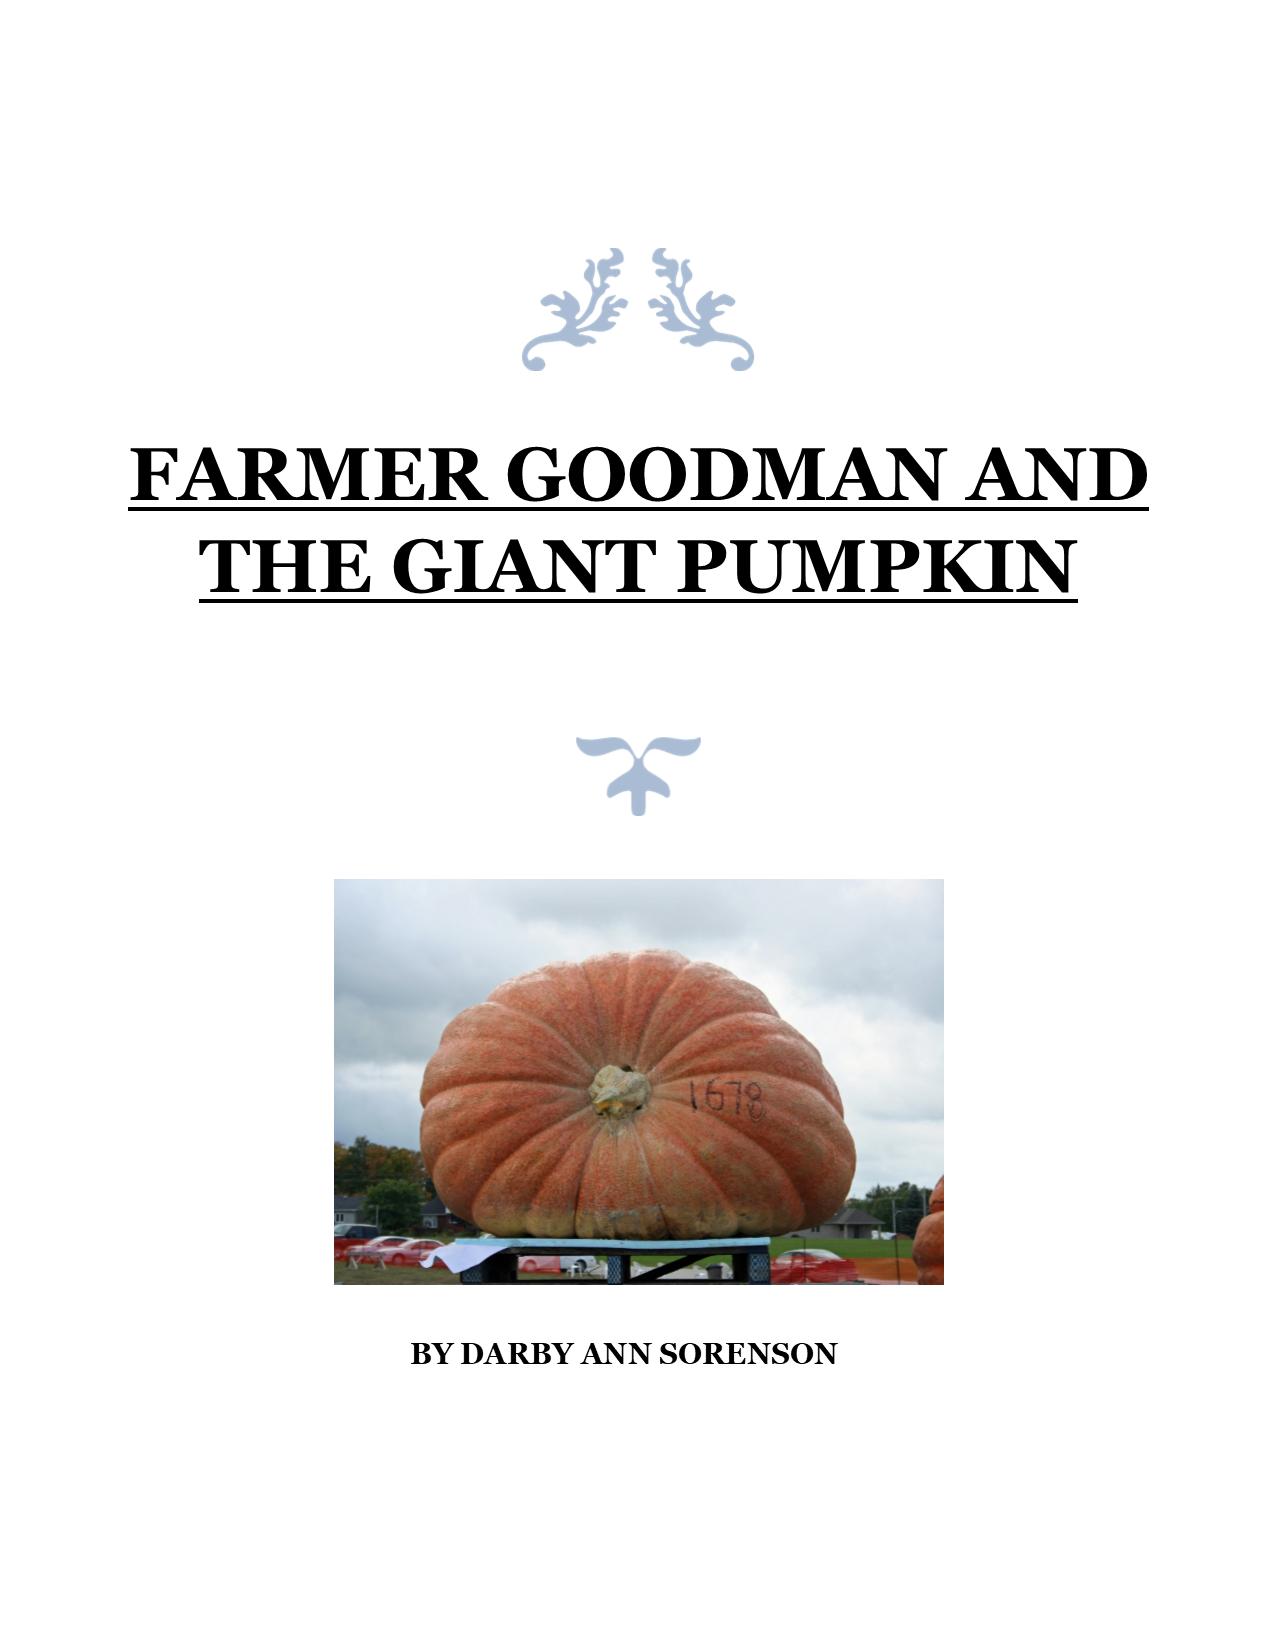 #2 - Farmer Goodman and the Giant Pumpkin 00016